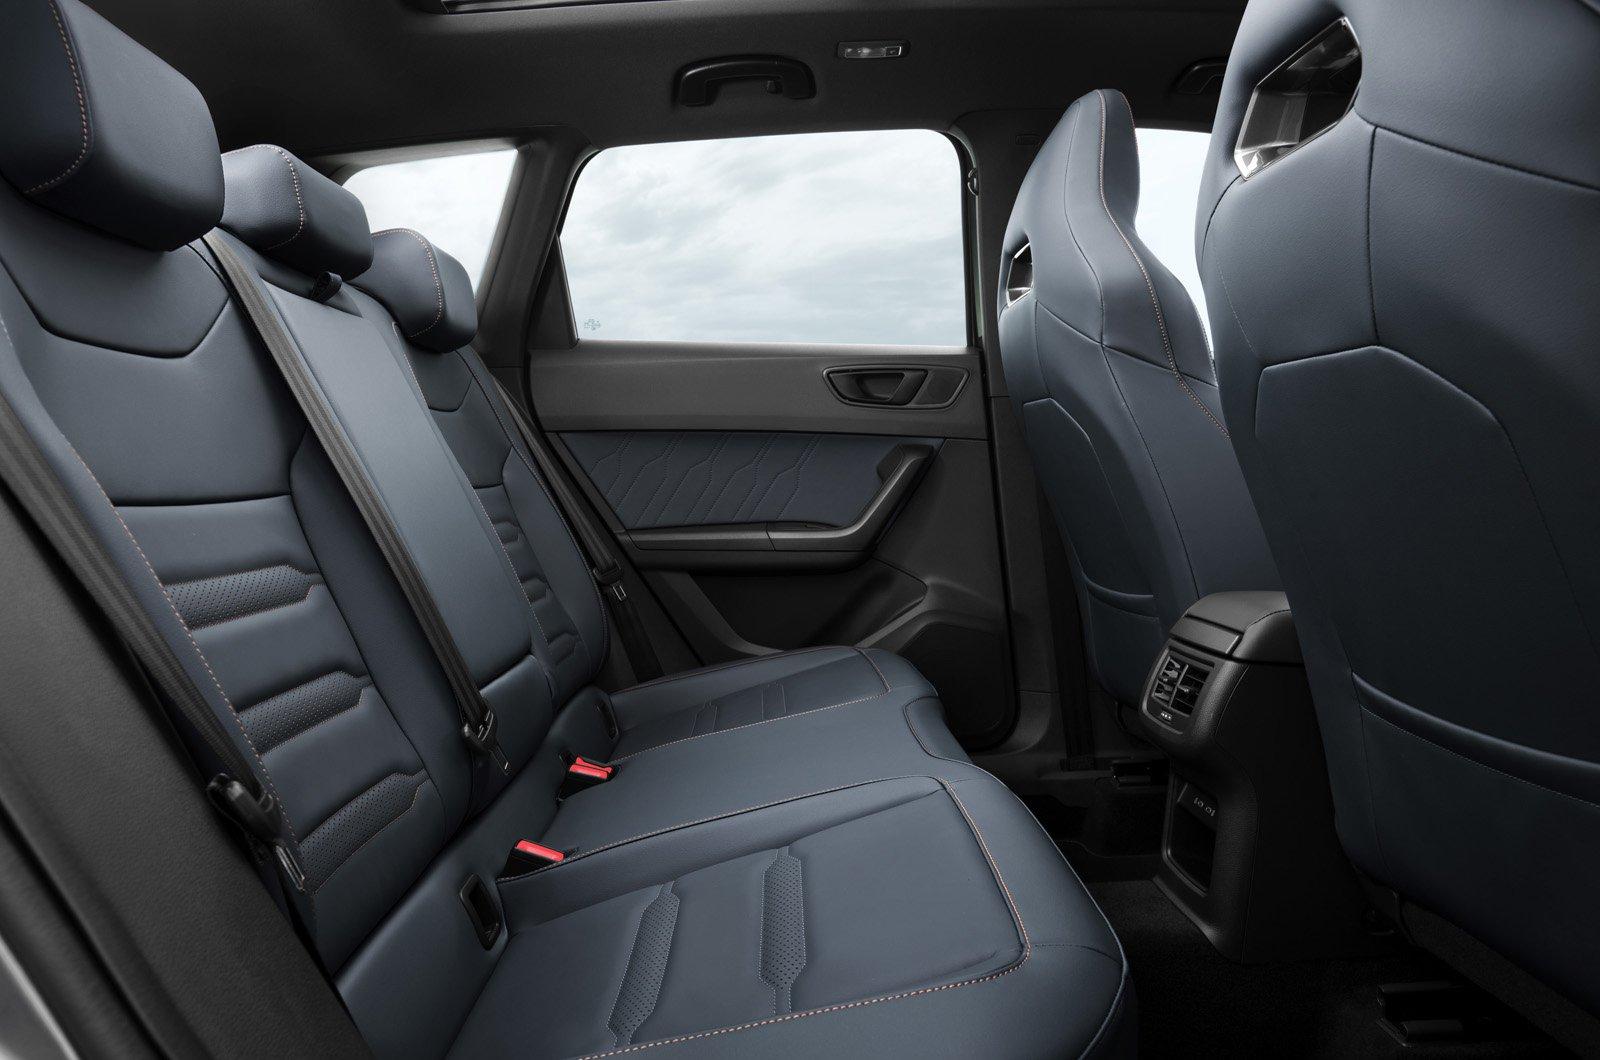 Cupra Ateca 2021 rear seats